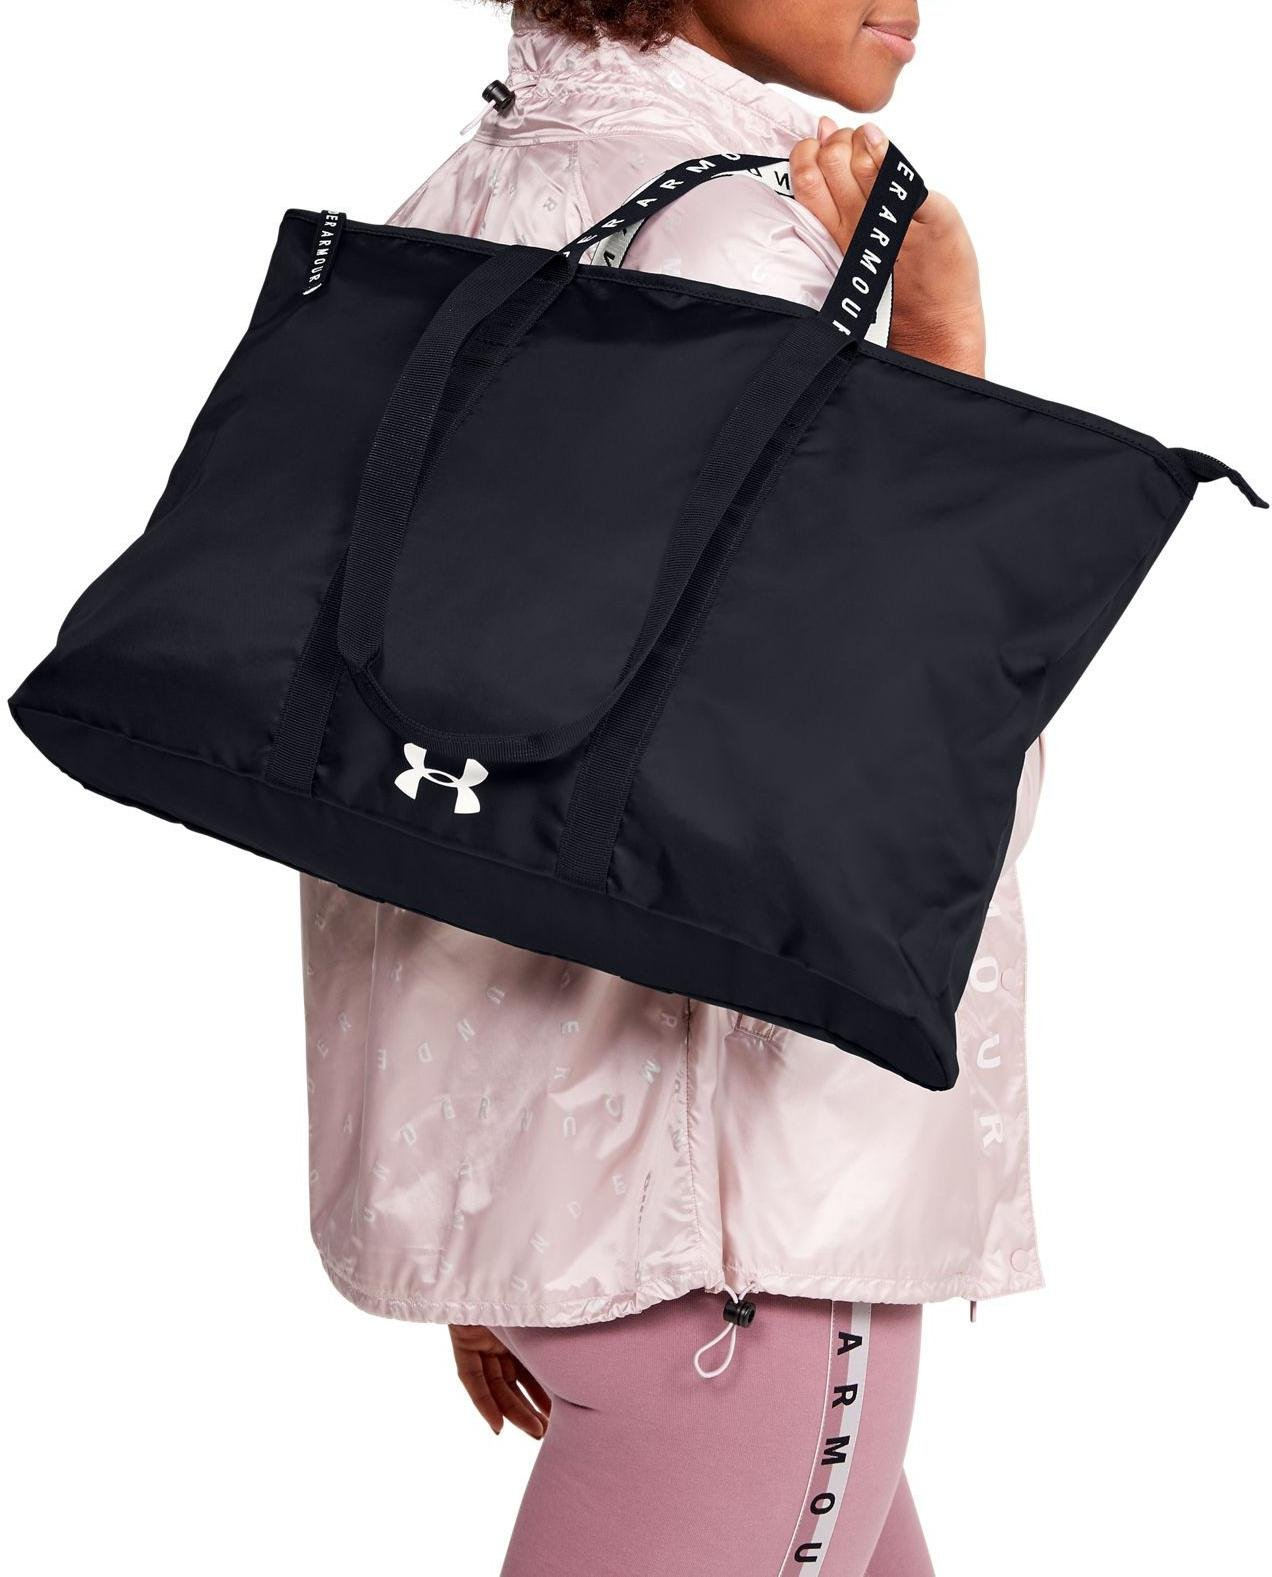 Bag Under Armour Under Armour Favorite 2.0 Tote - Top4Fitness.com